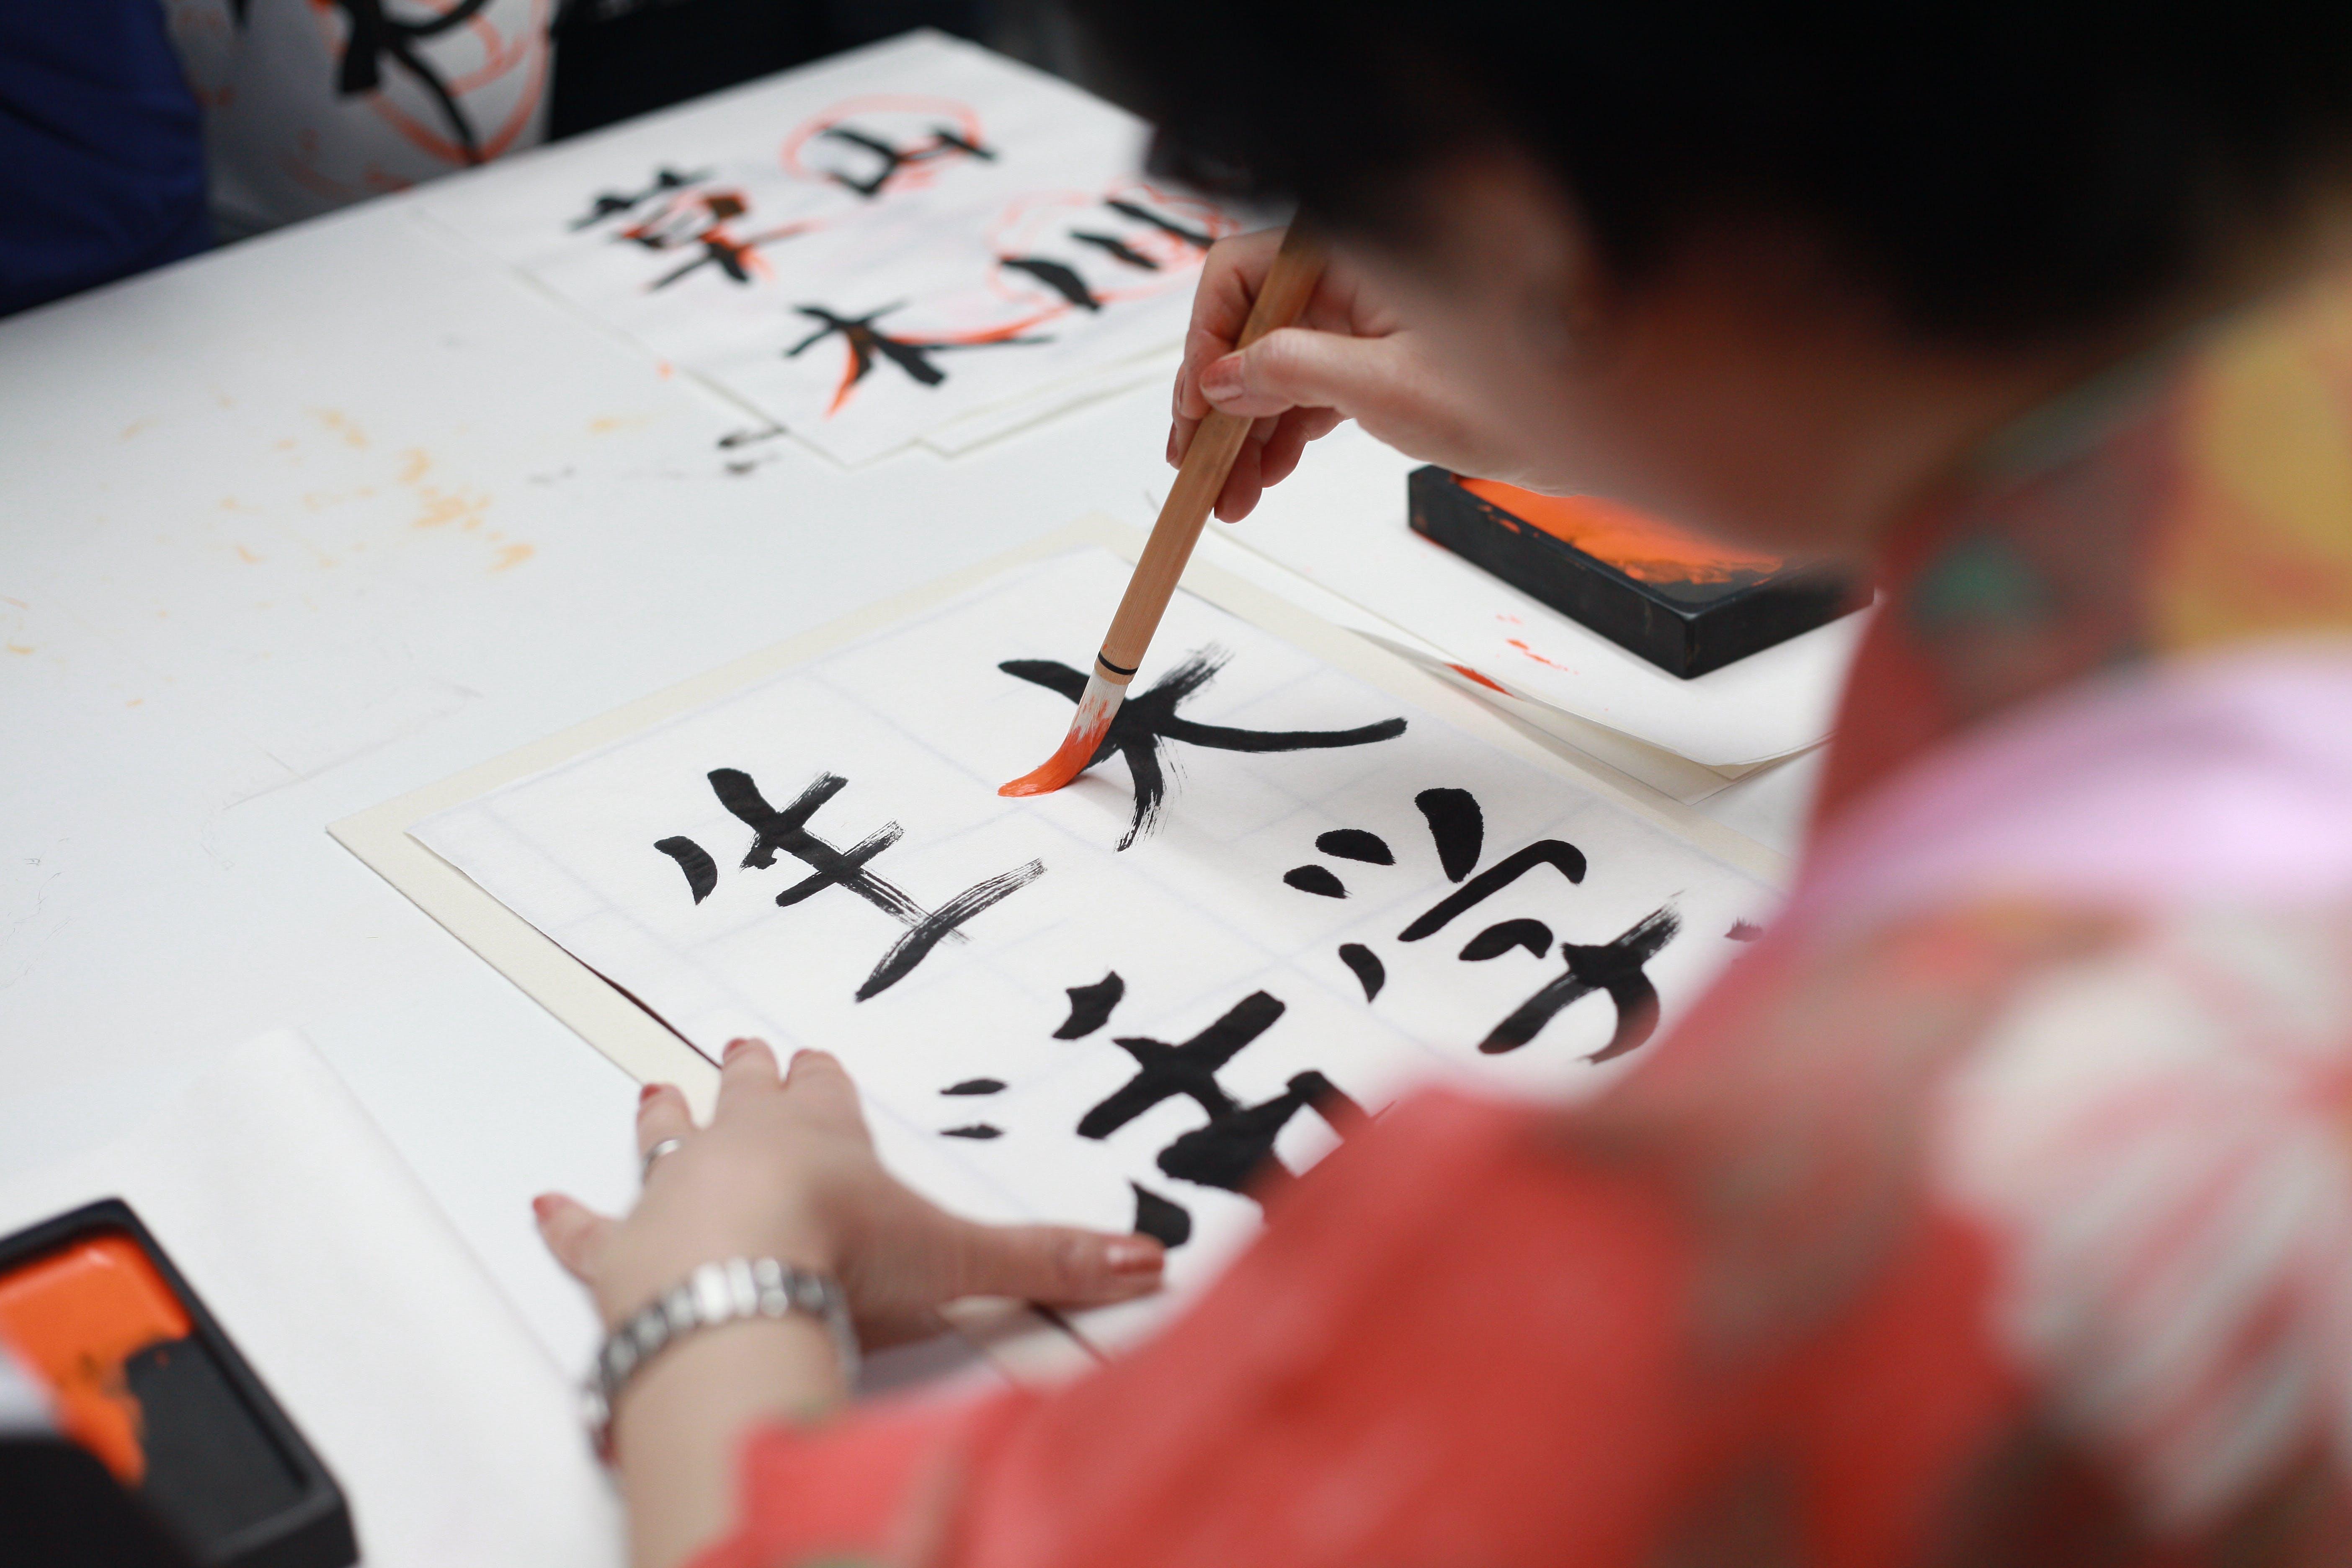 Person Holding Brush Drawing Kanji Script